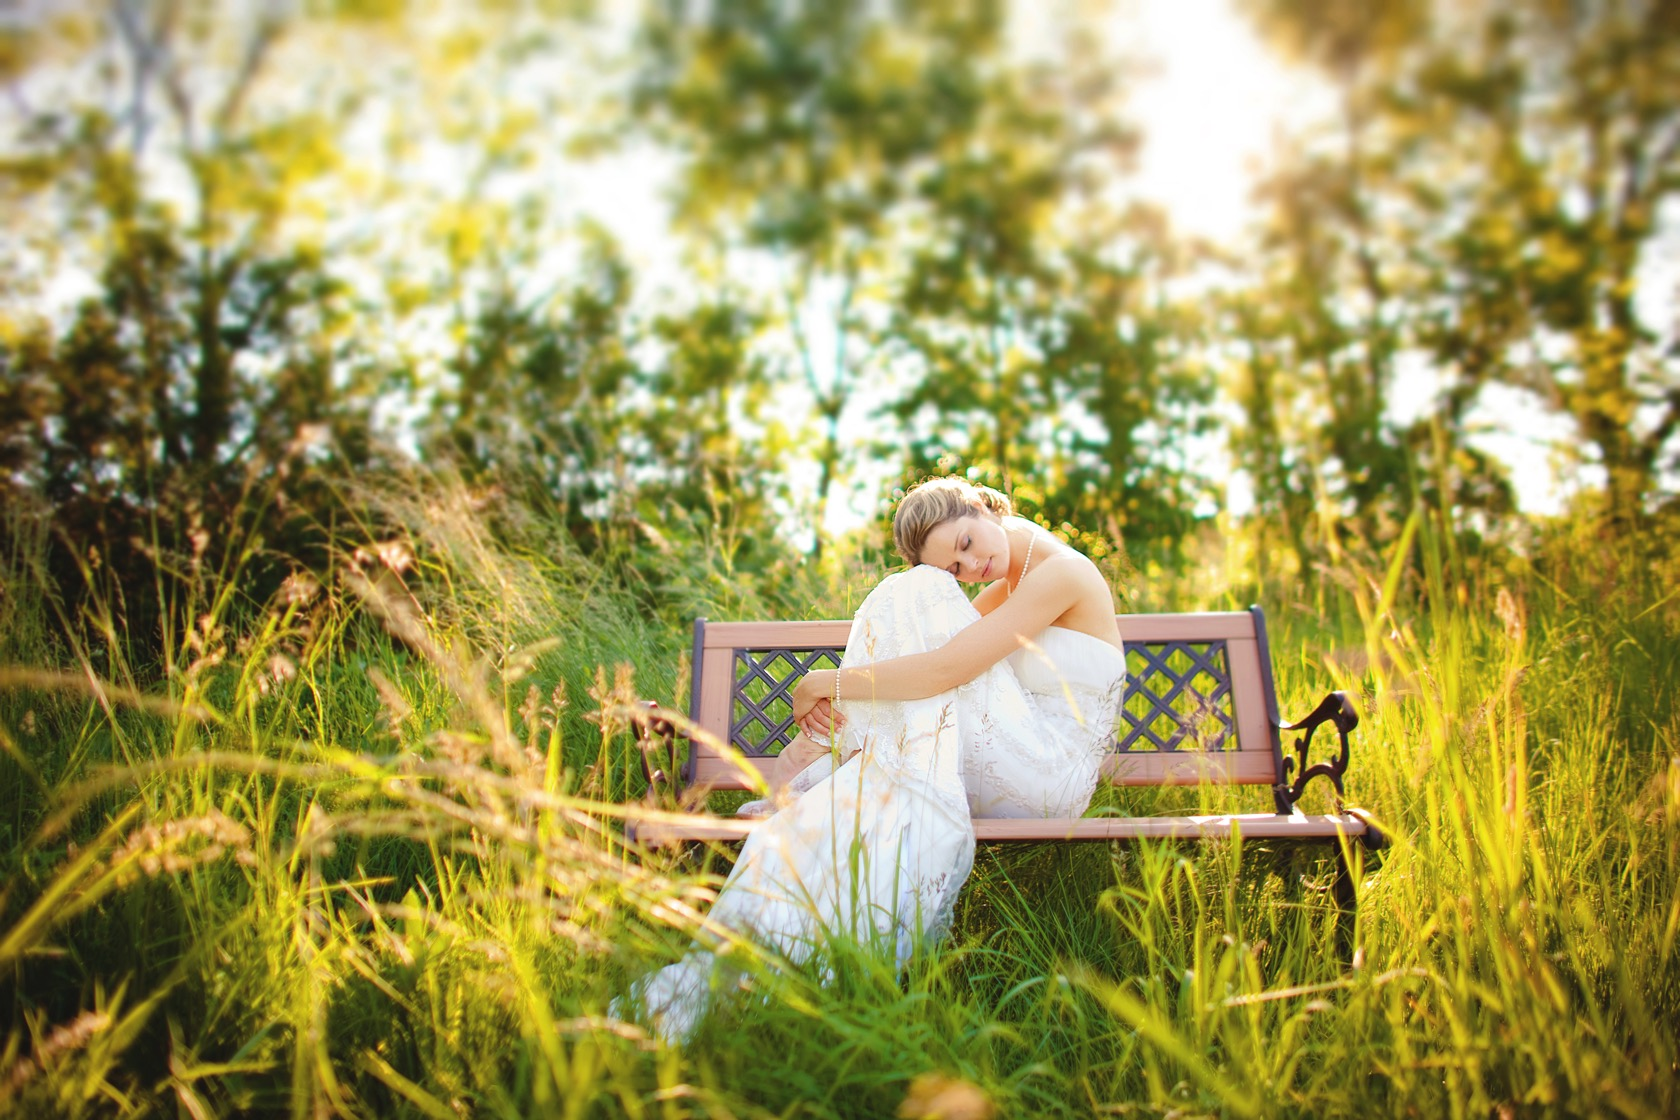 stephen sager photography 2001 toronto wedding photography